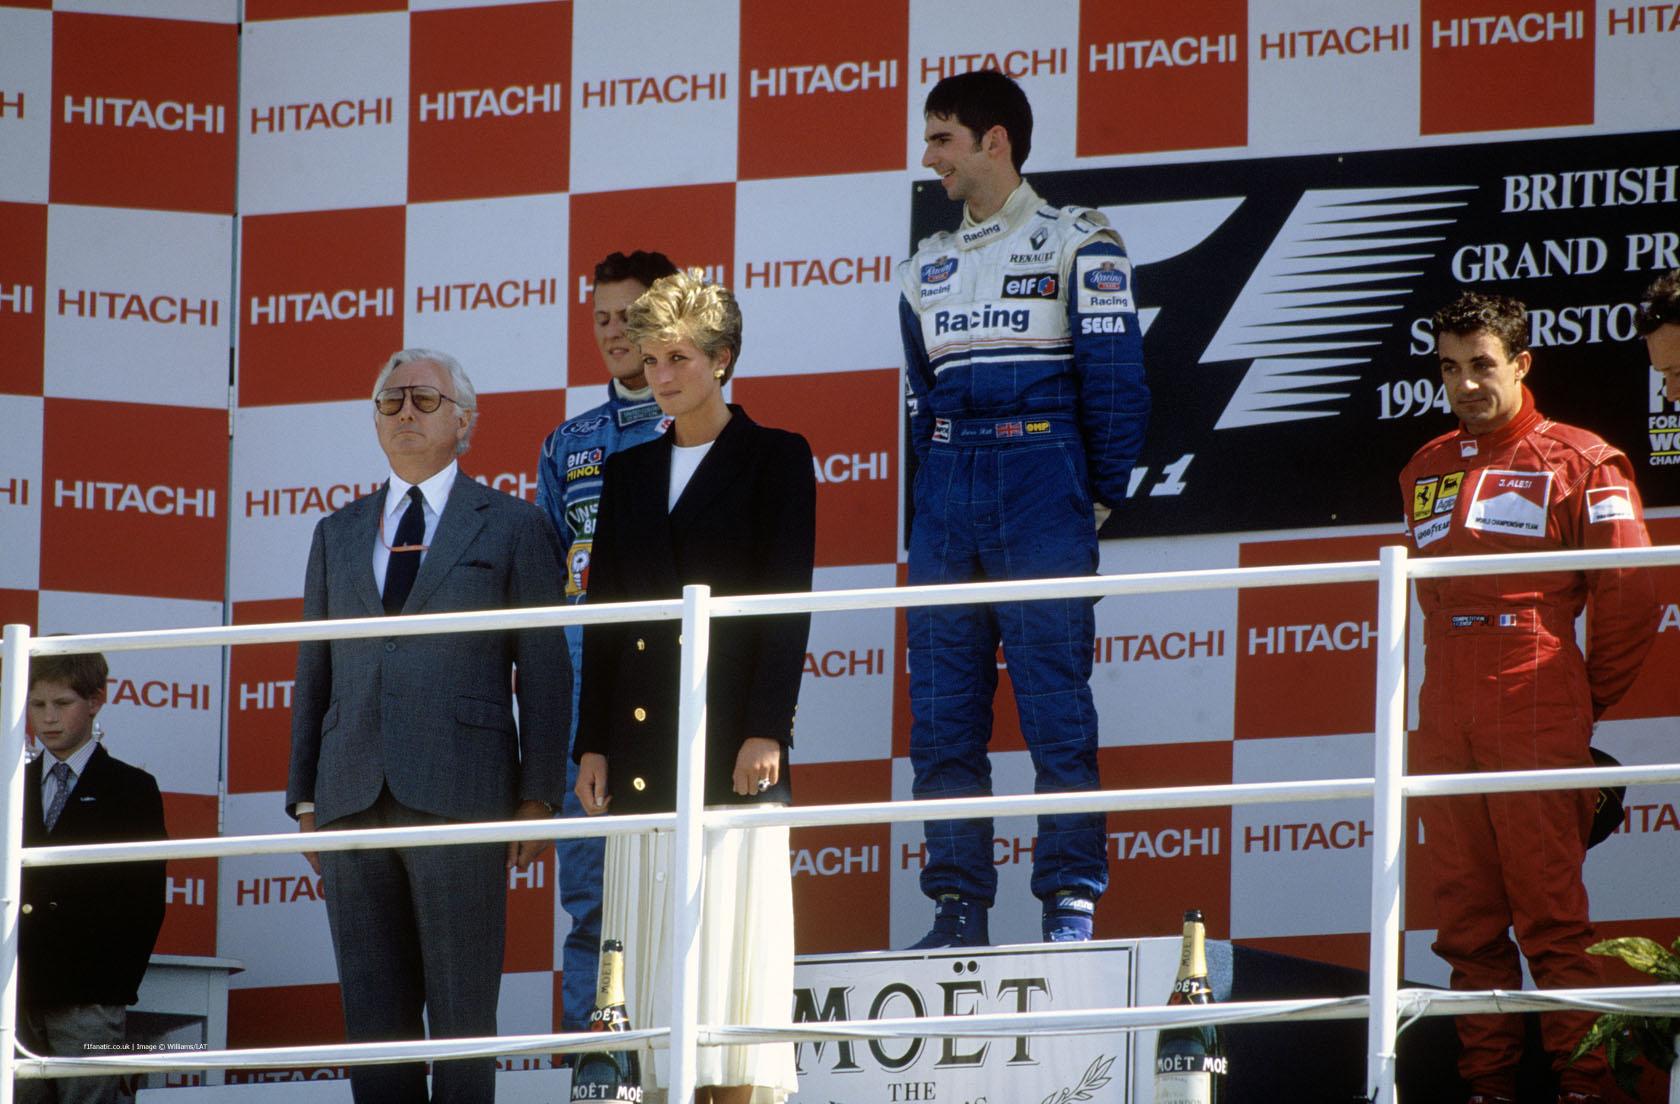 Michael Schumacher, Damon Hill, Jean Alesi, Silverstone, 1994